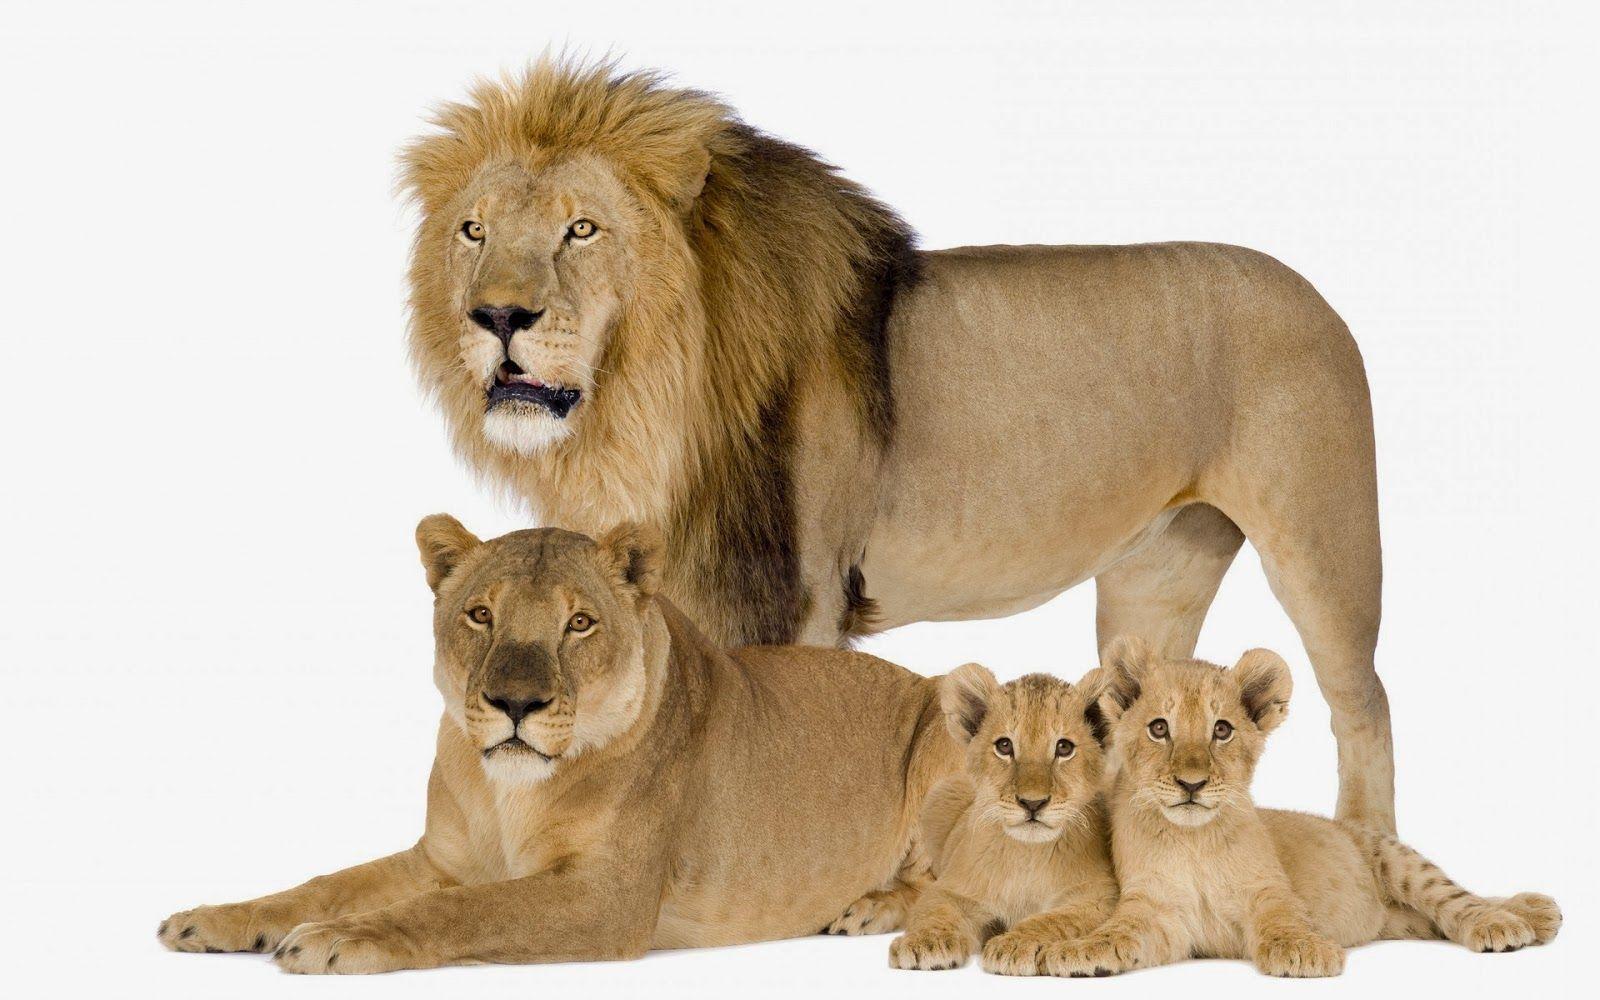 Lion family wallpaper - photo#36